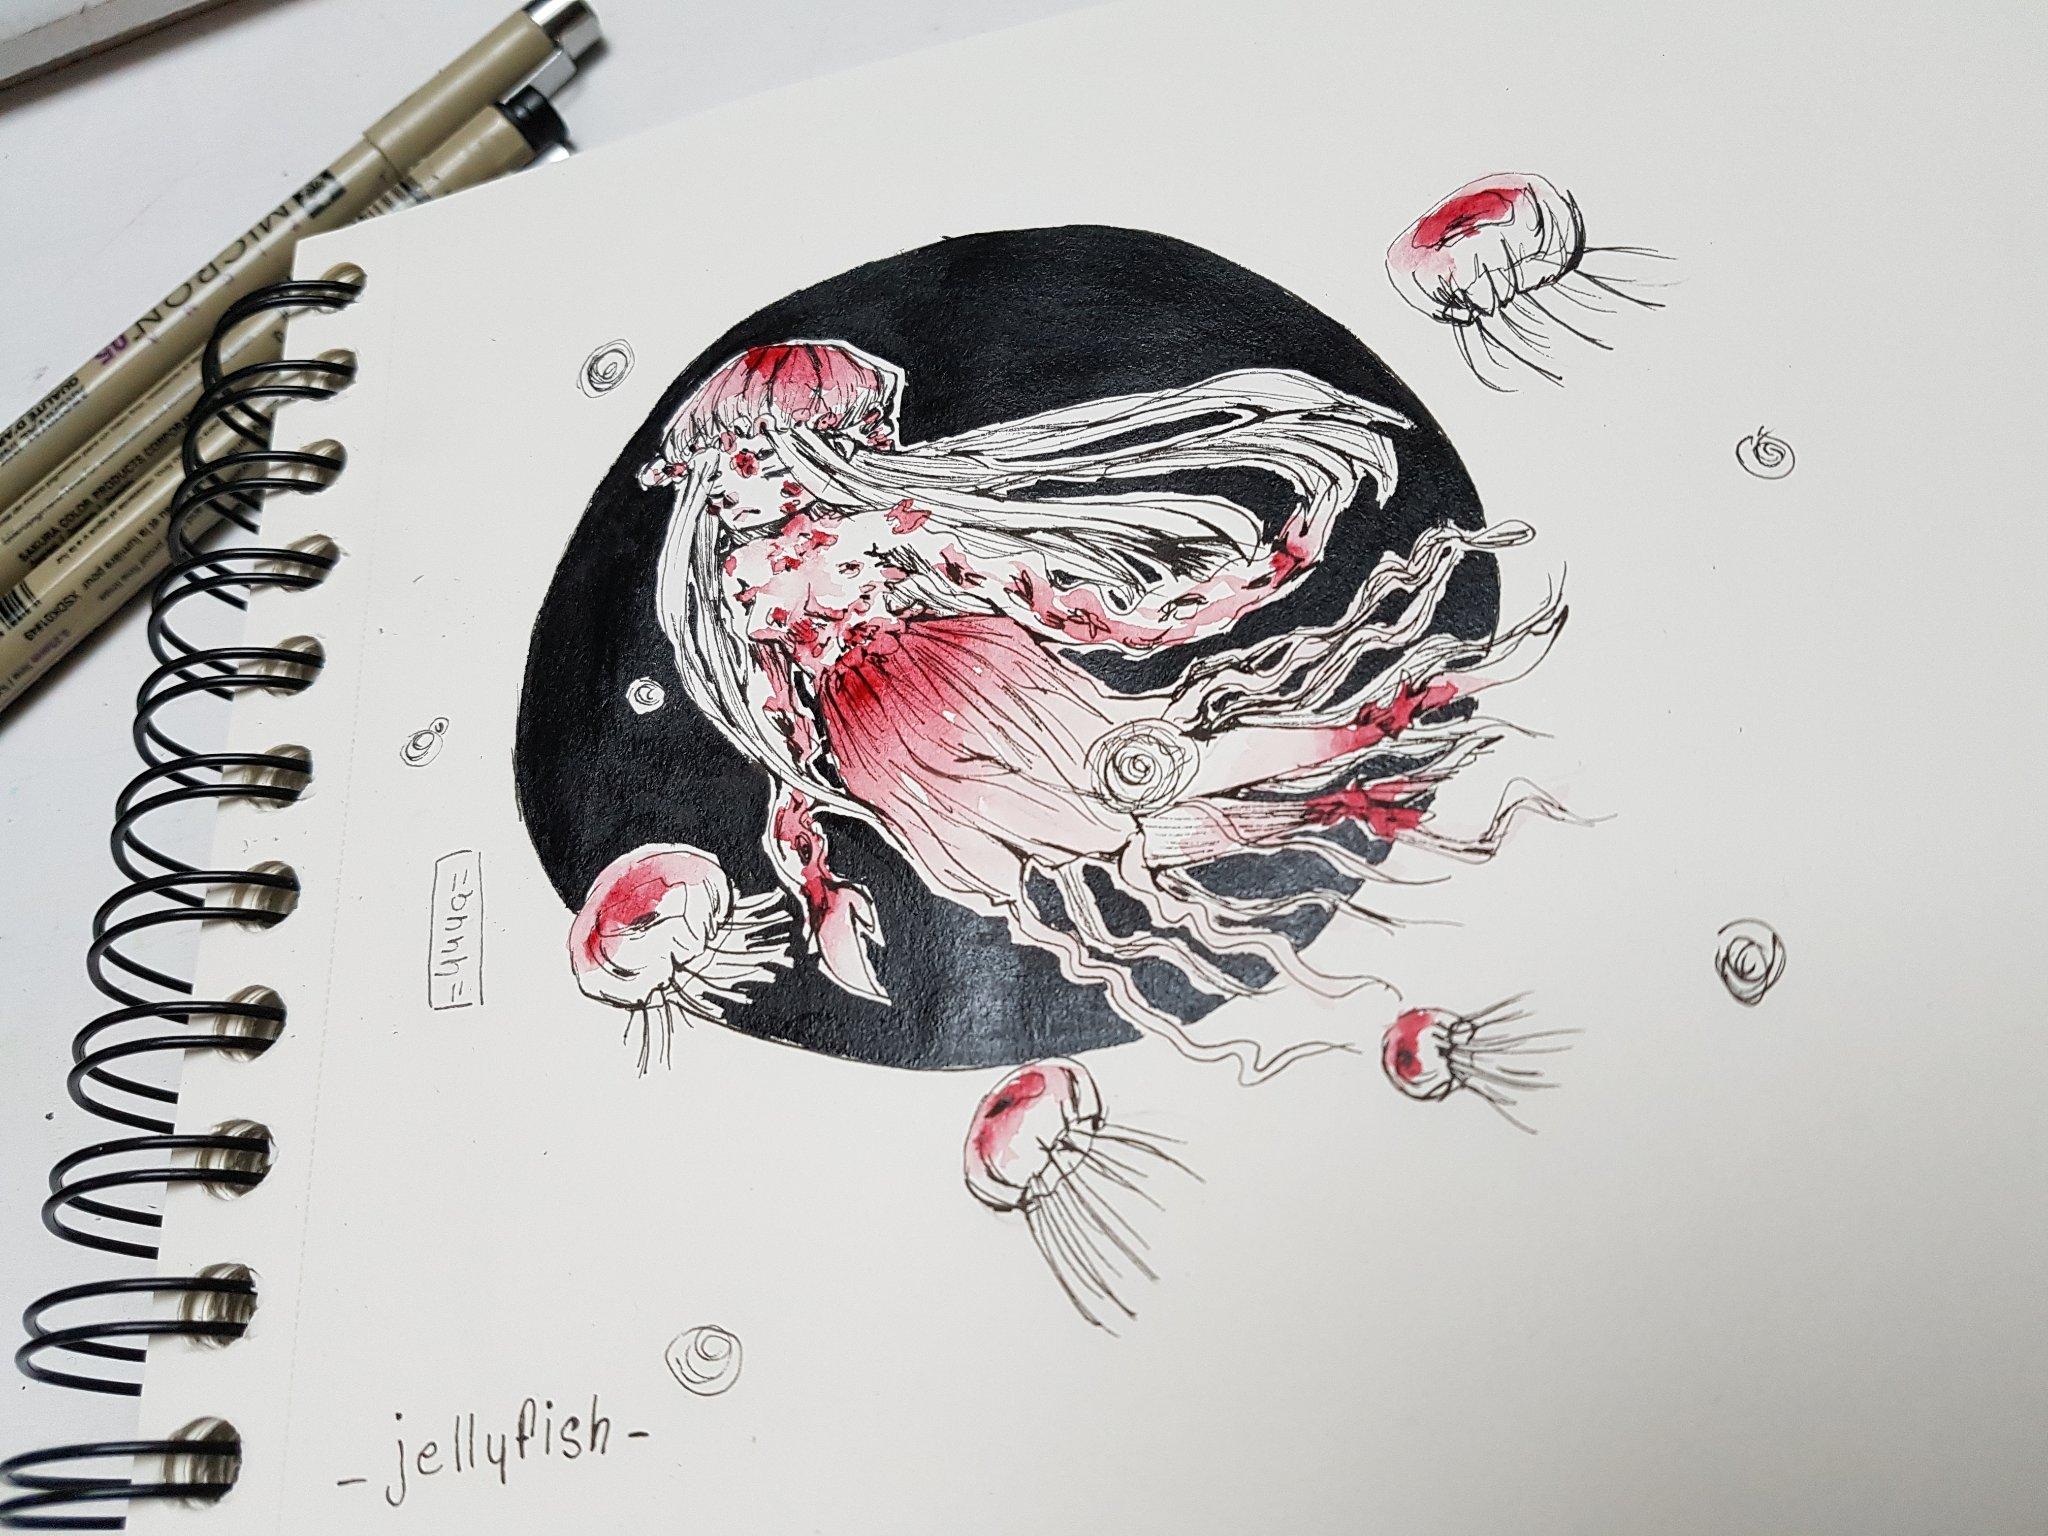 Hors thèmes – Yuya Joestar, Inktober 2018